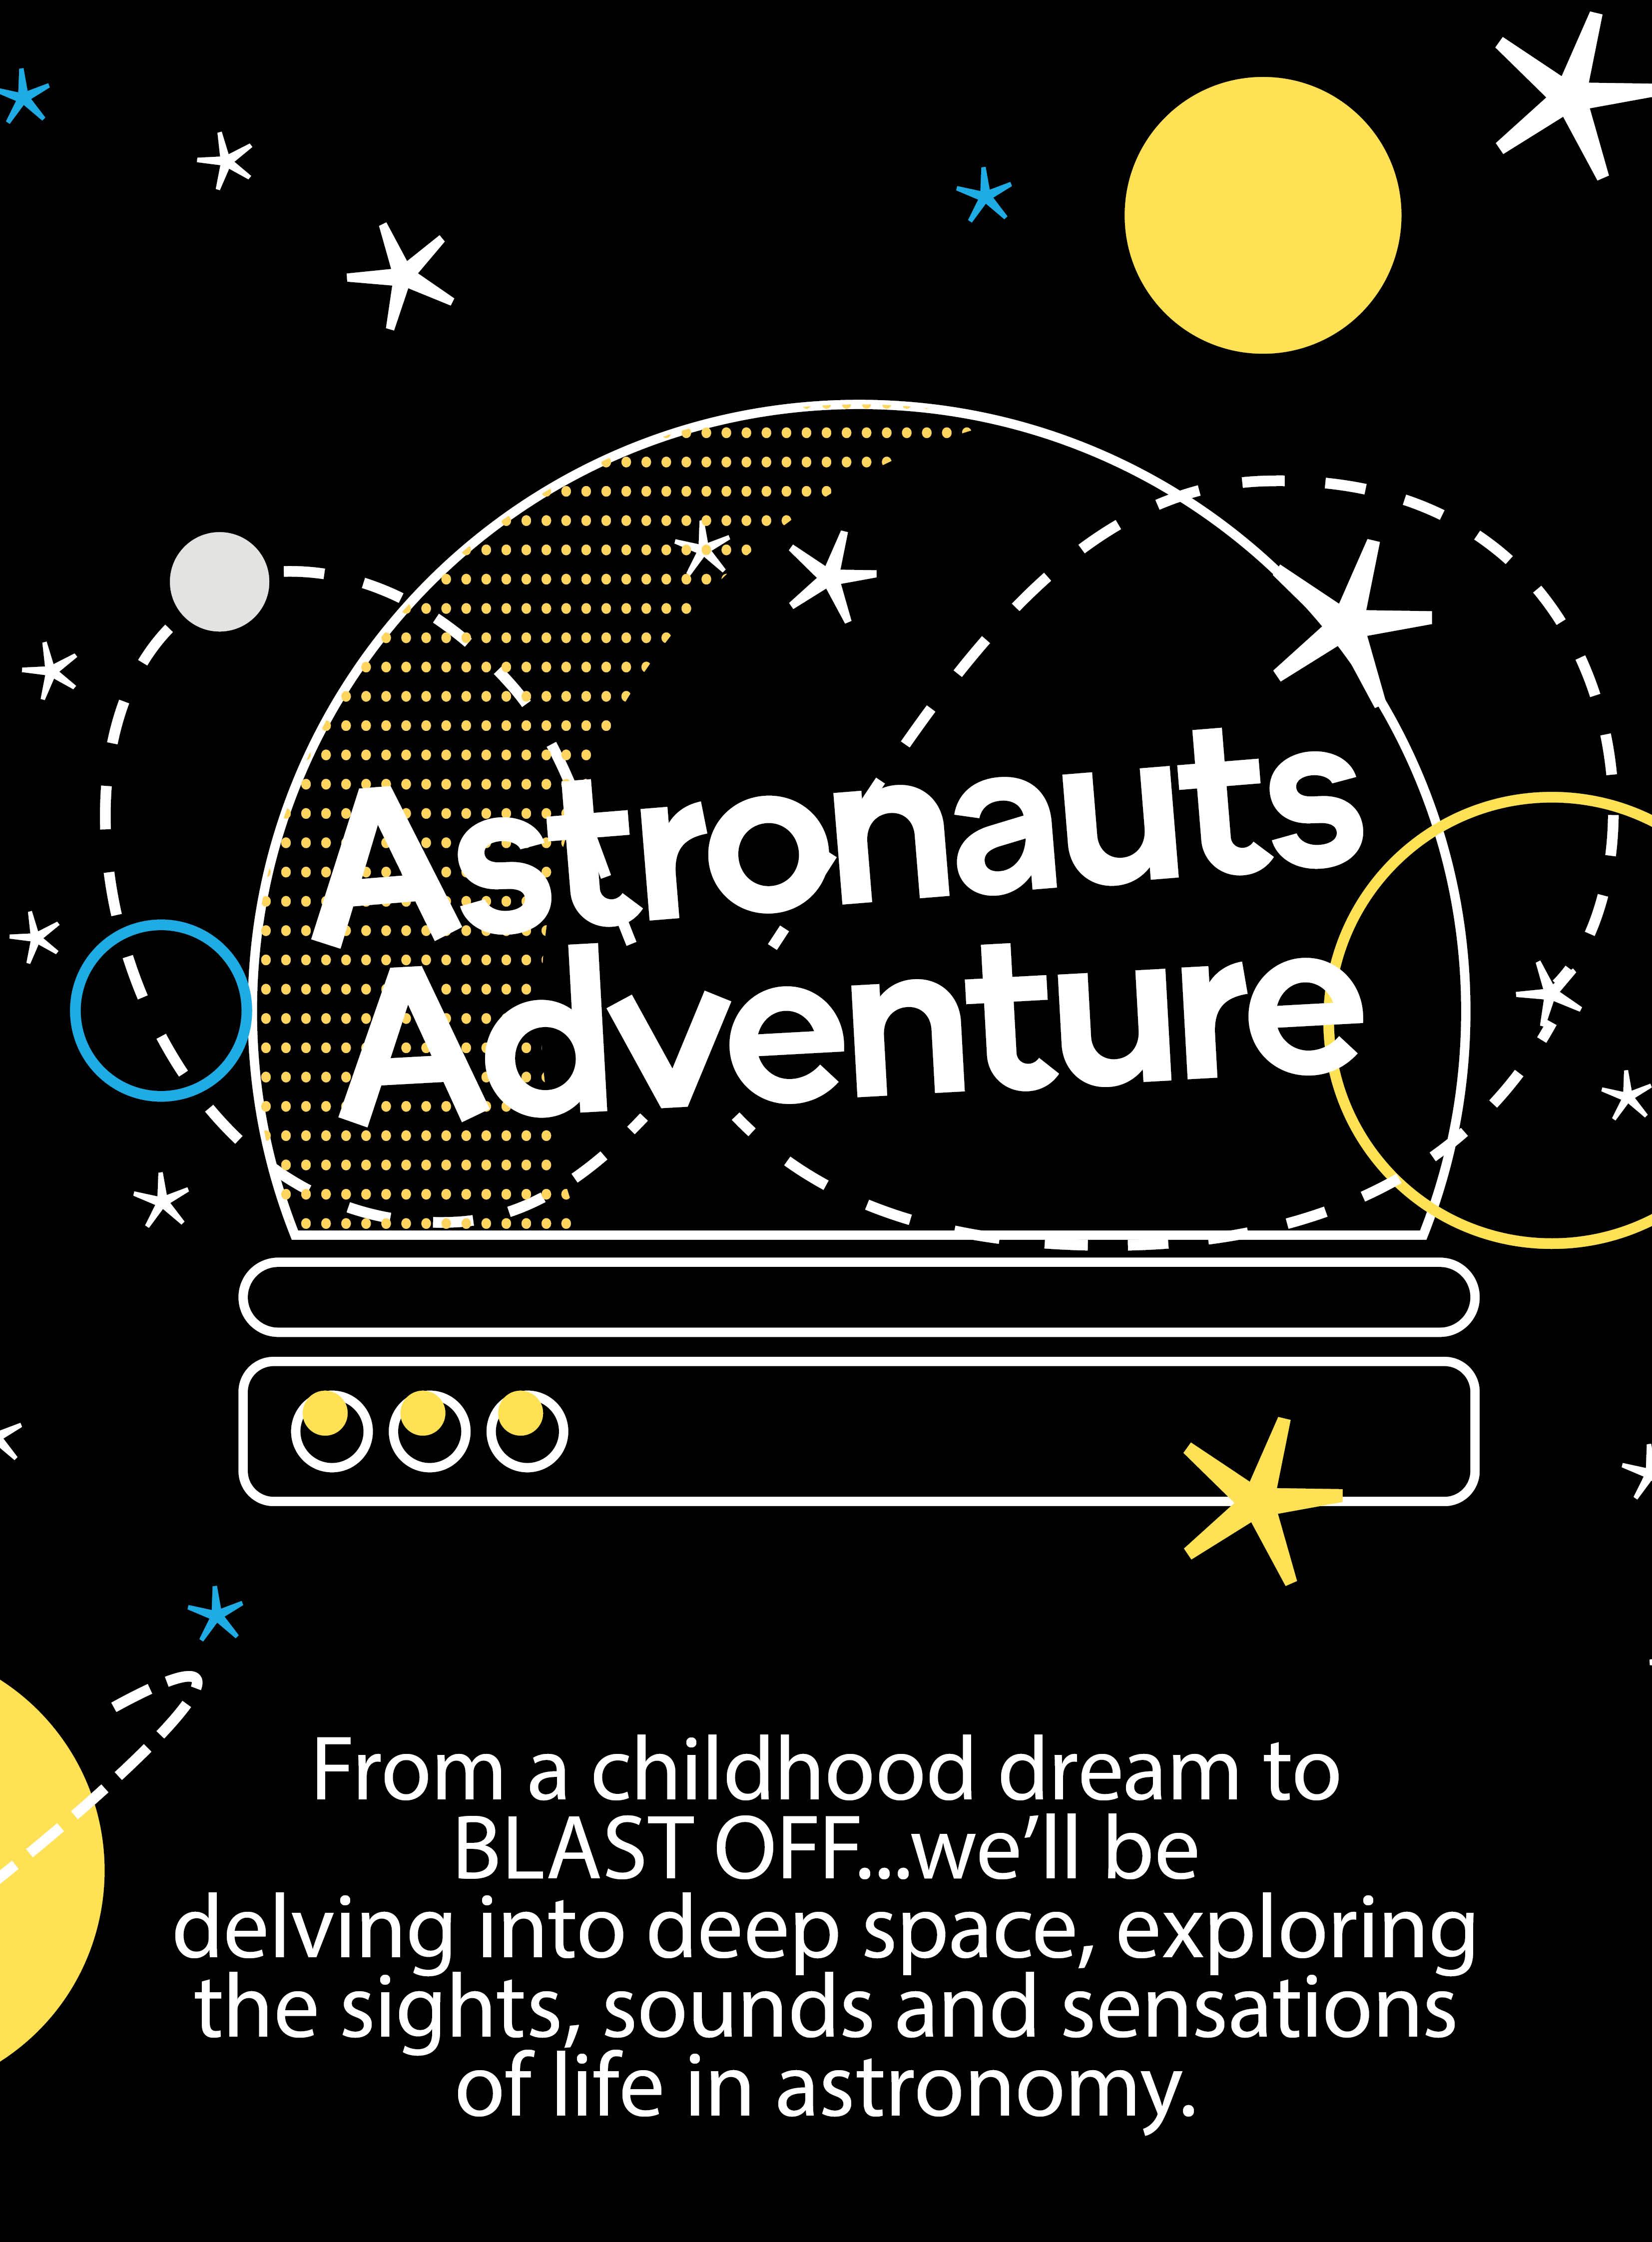 Astronauts_Adventure_Single